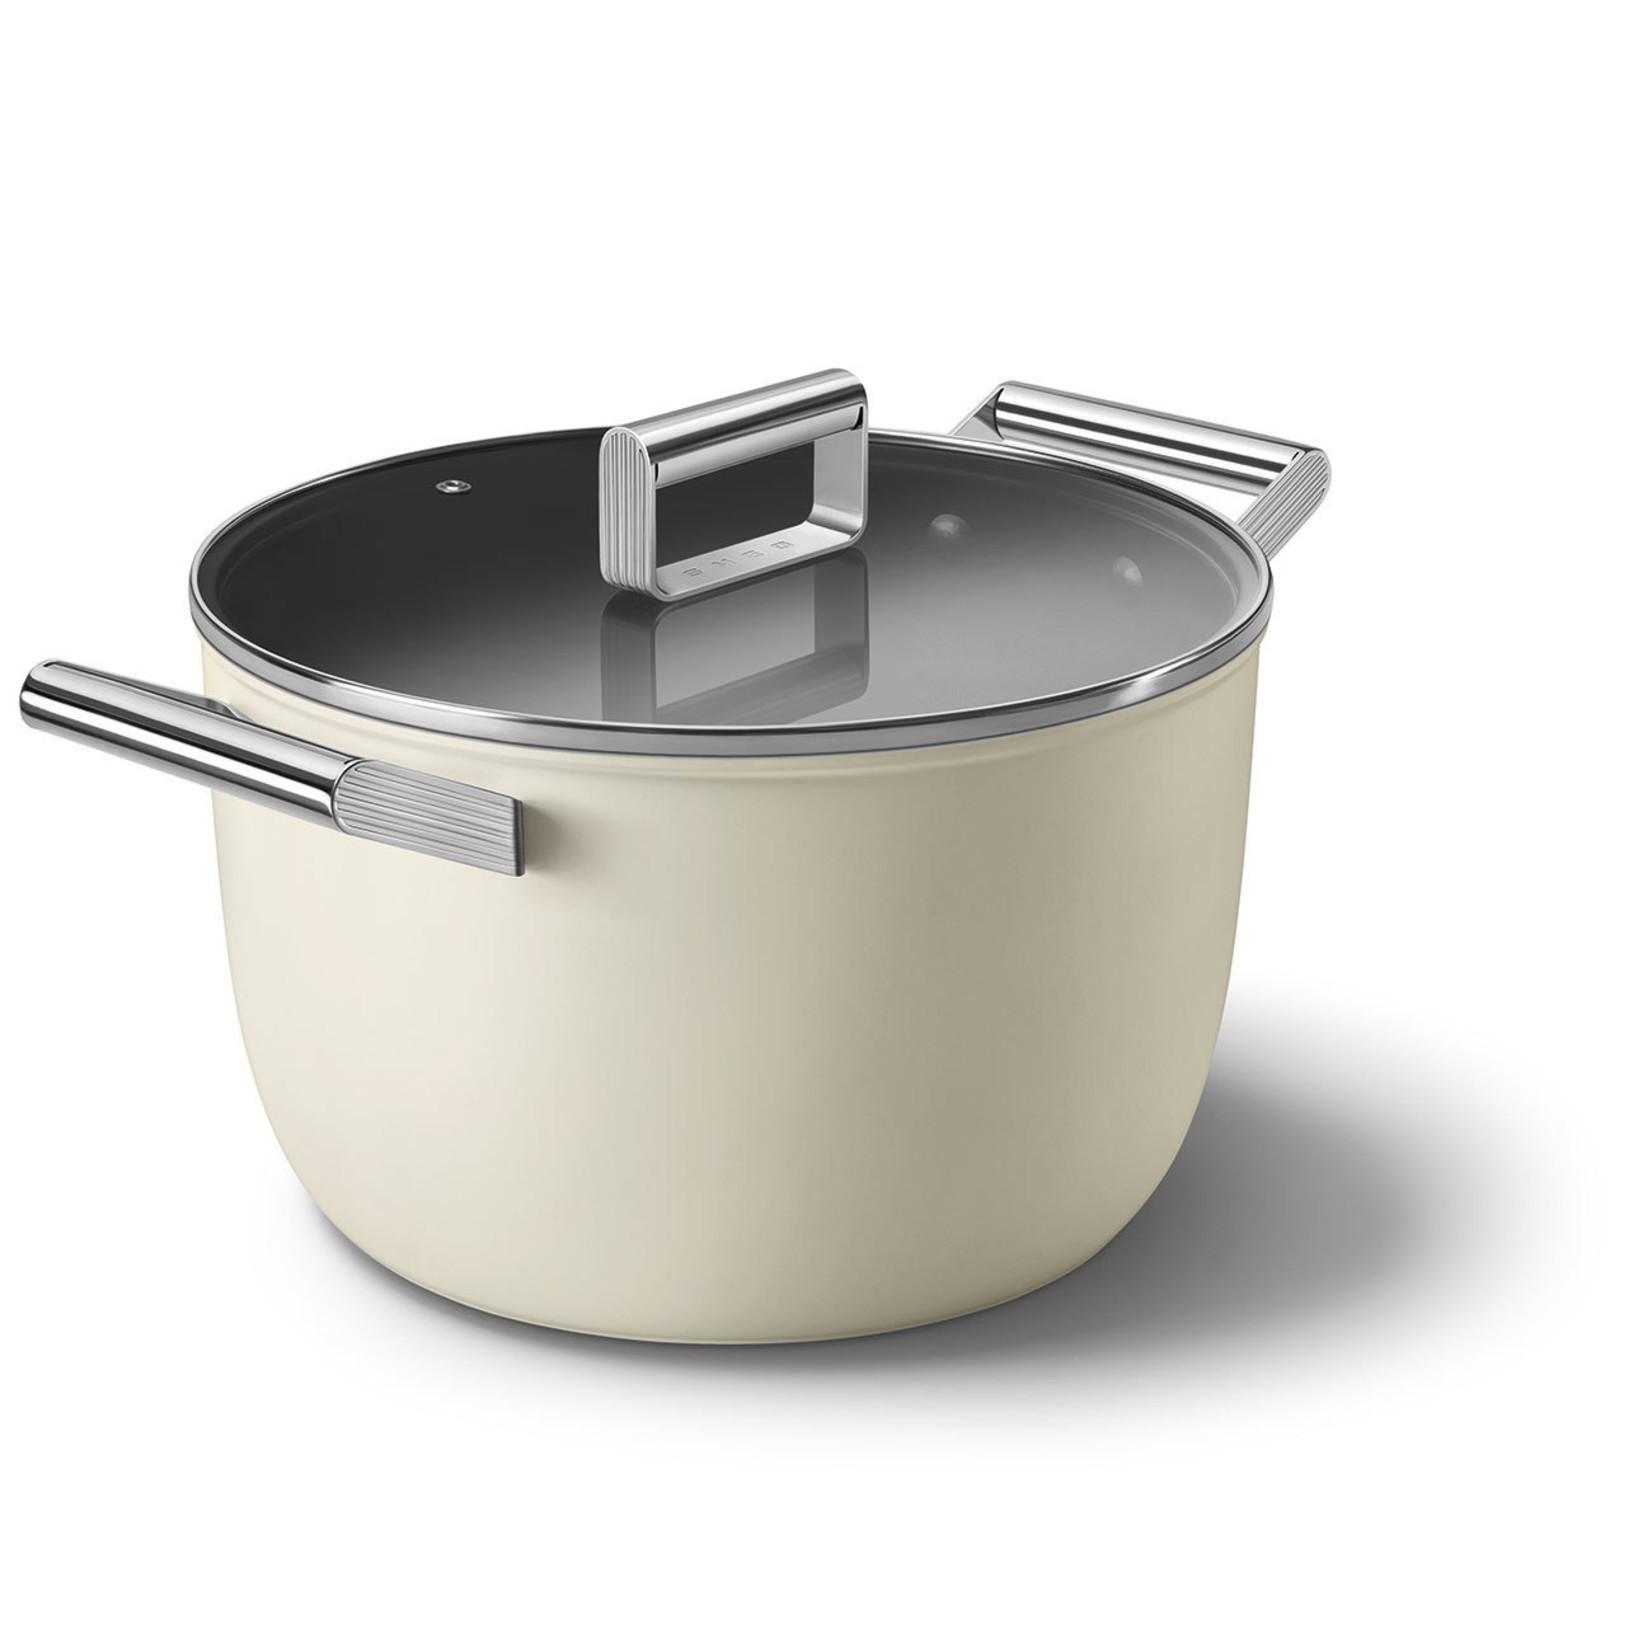 Smeg SMEG Kookpan met deksel 26 cm, anti-aanbaklaag, crème mat